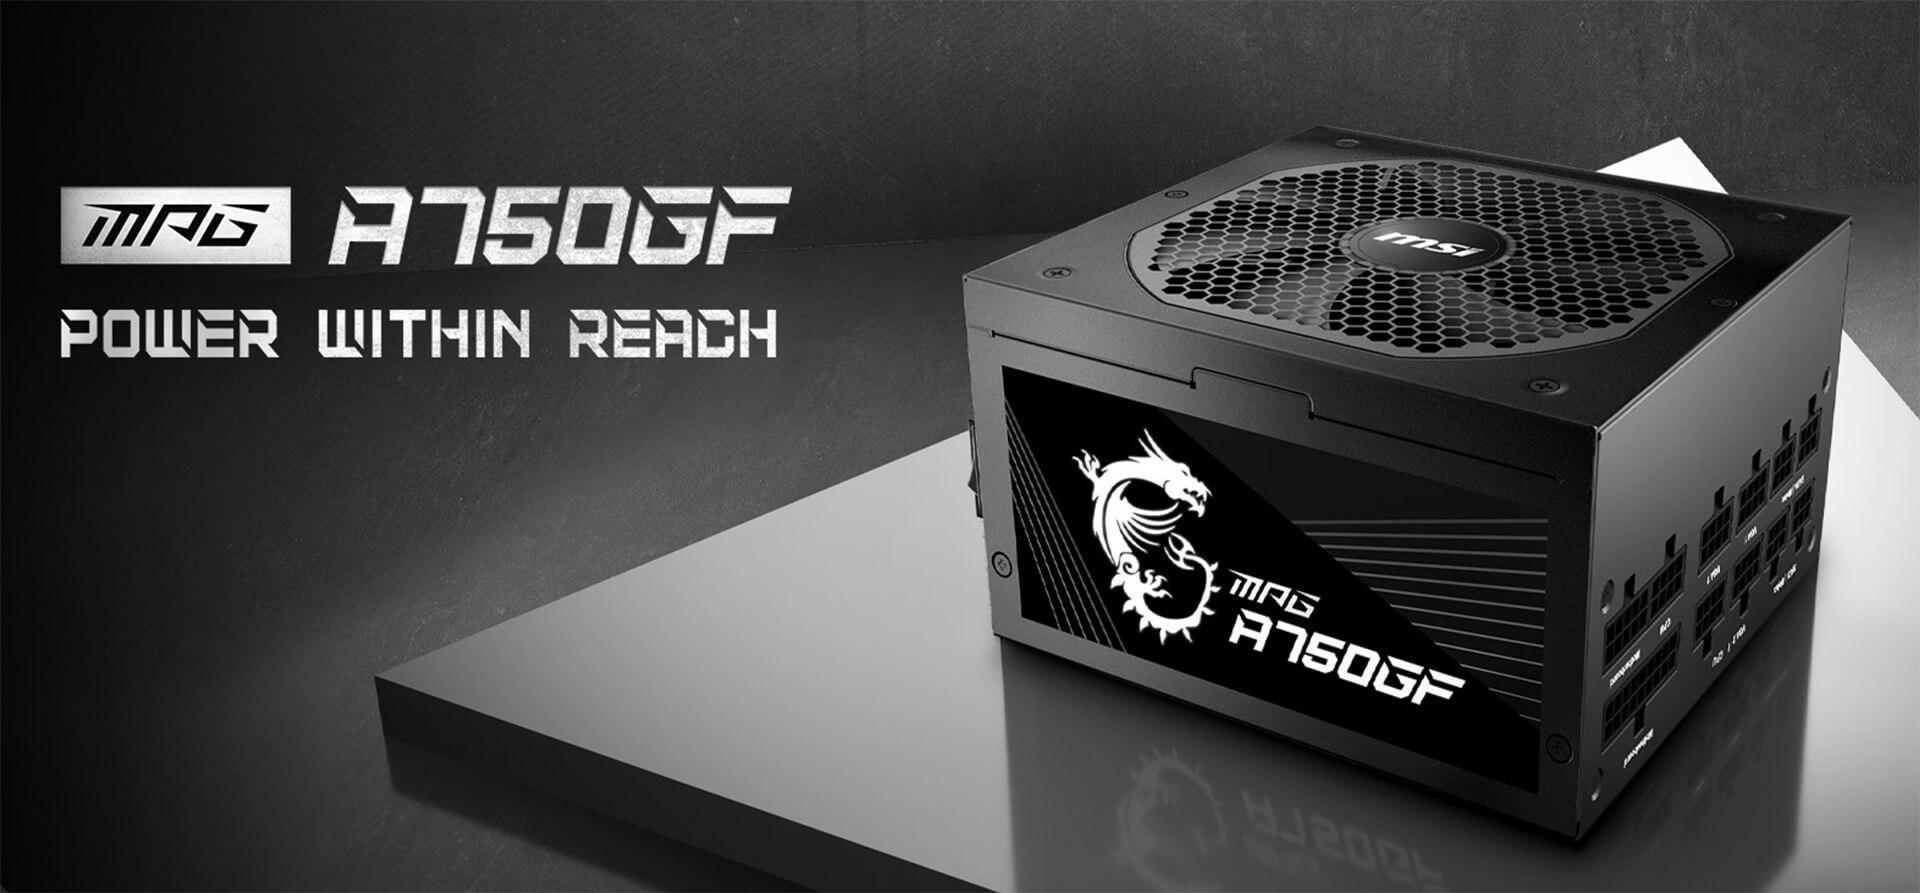 Msi Mpg A750gf 750w 80plus Gold Fully Modular Feature